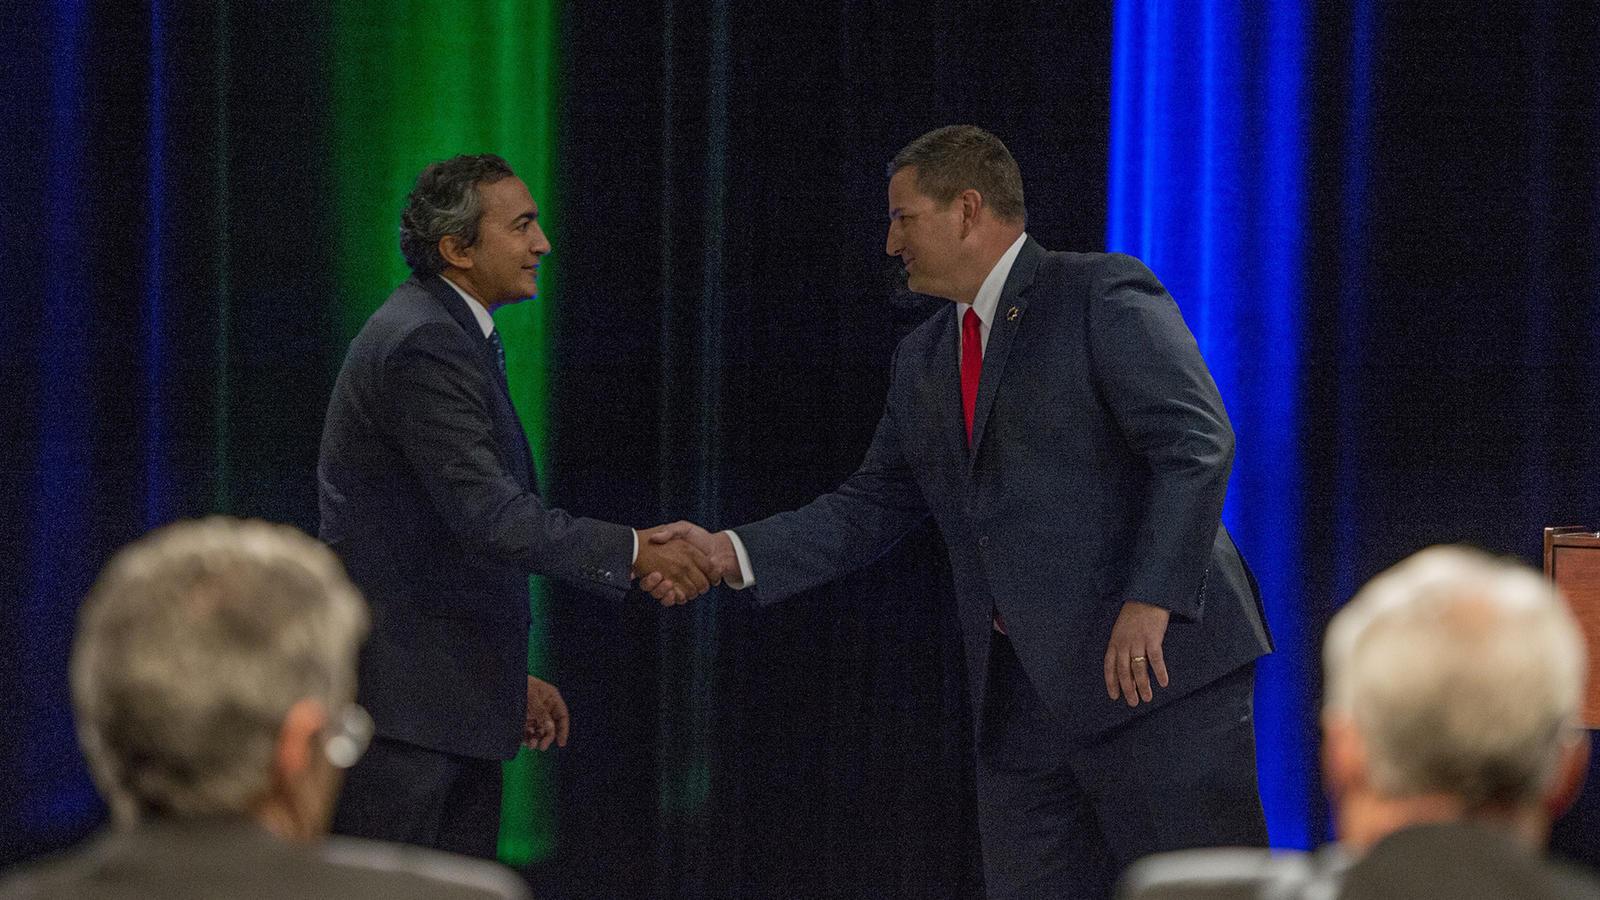 Democratic U.S. Rep. Ami Bera shakes hands with his Republican challenger, Sacramento County Sheriff Scott Jones. (Jose Luis Villegas / Associated Press)